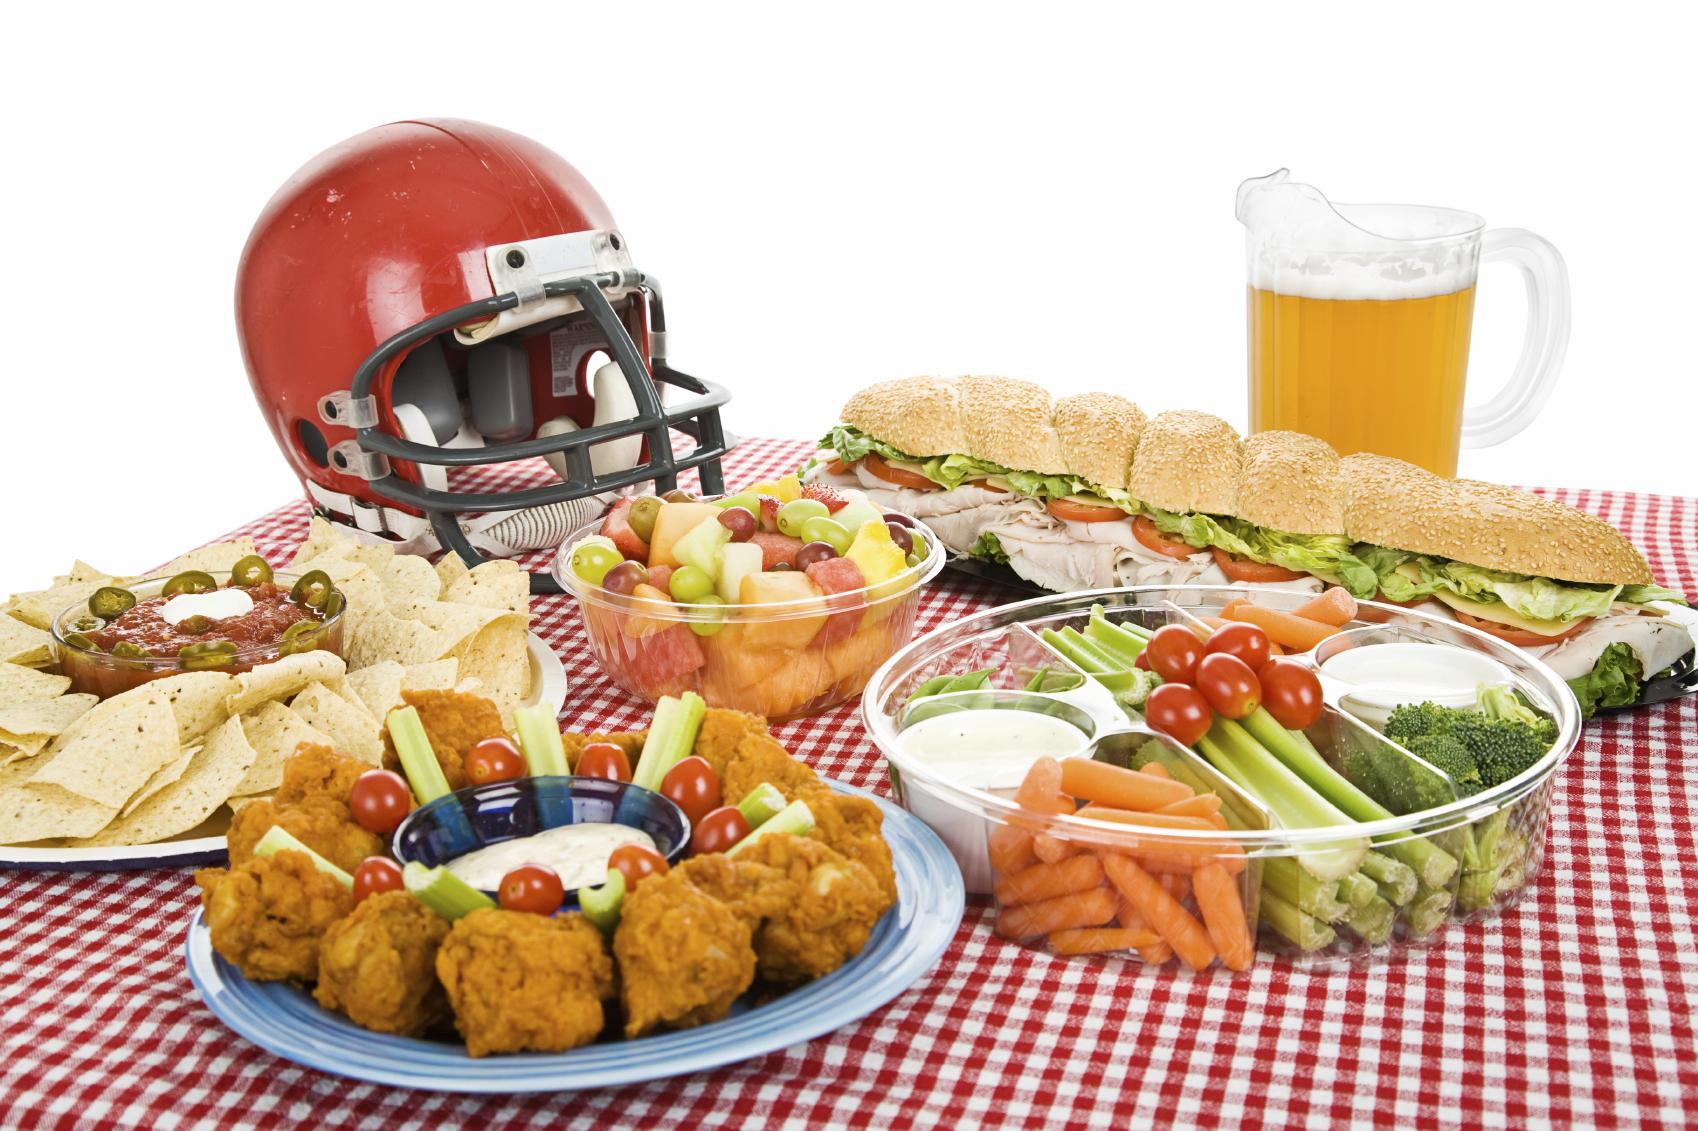 Dinner in Orange CT | Dinner Wethersfield | Restaurant in Wethersfield | Chip's Family Restaurant